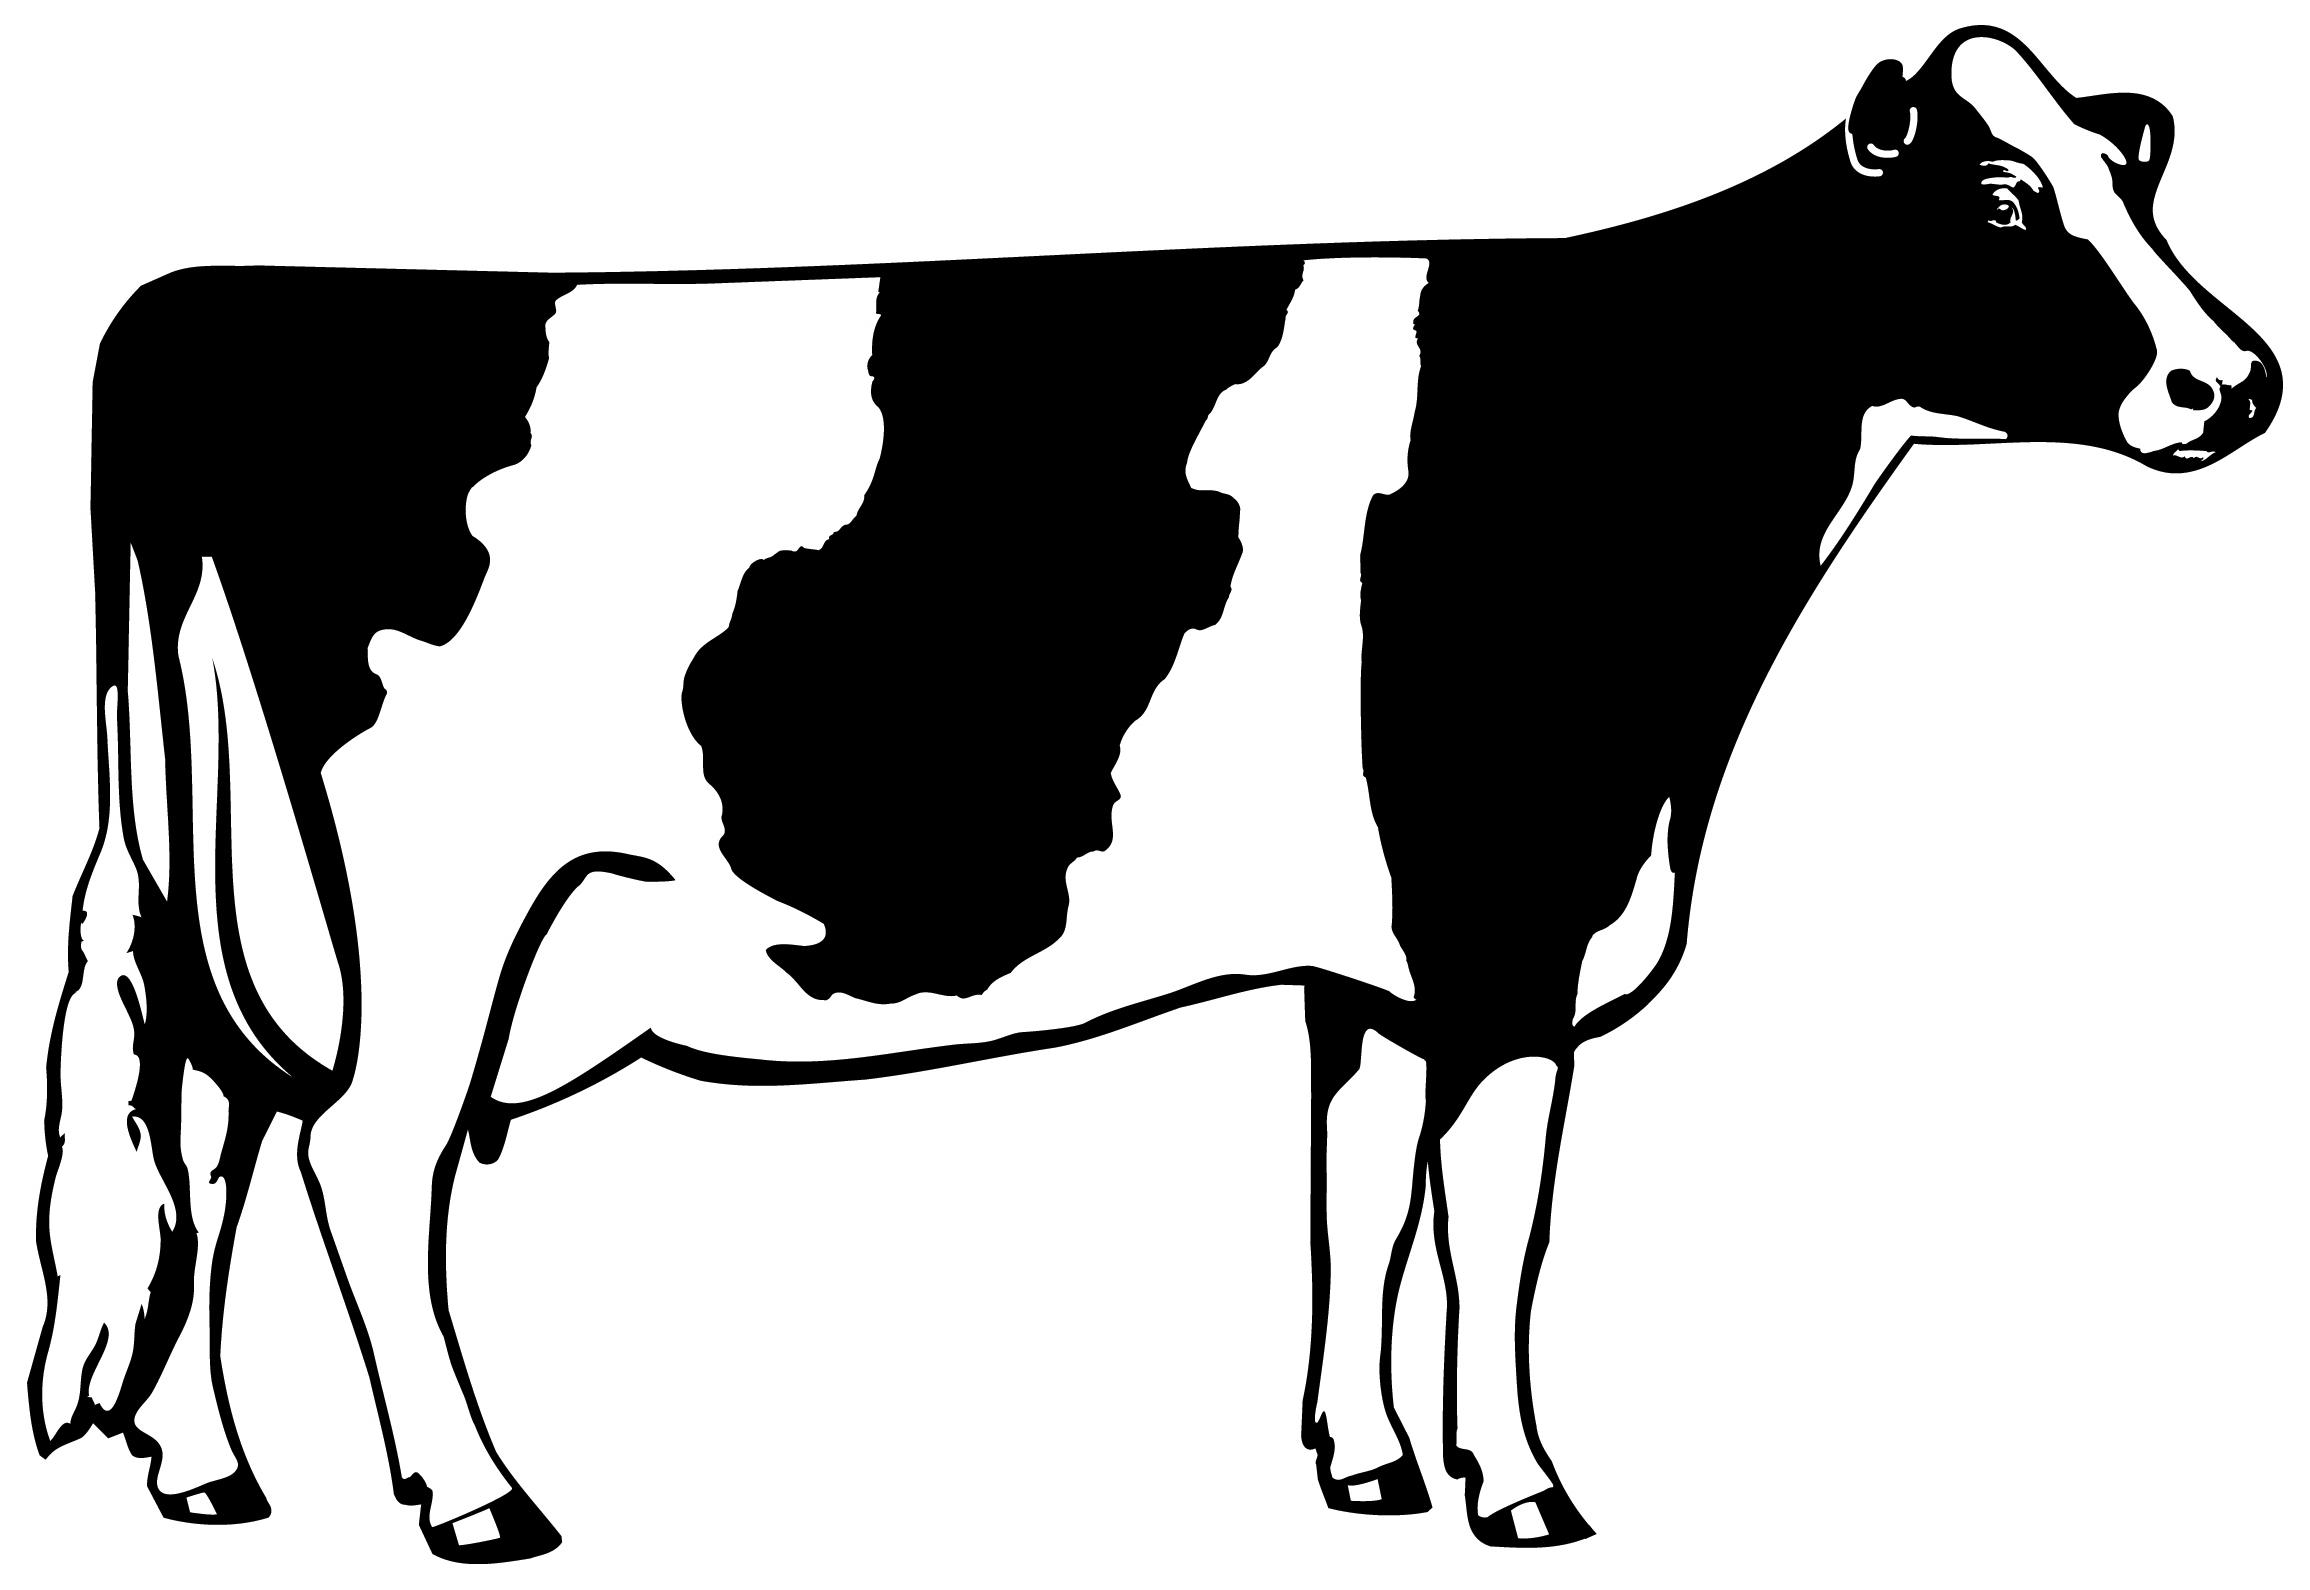 Cow silhouette black kid. Dairy clipart cows milk